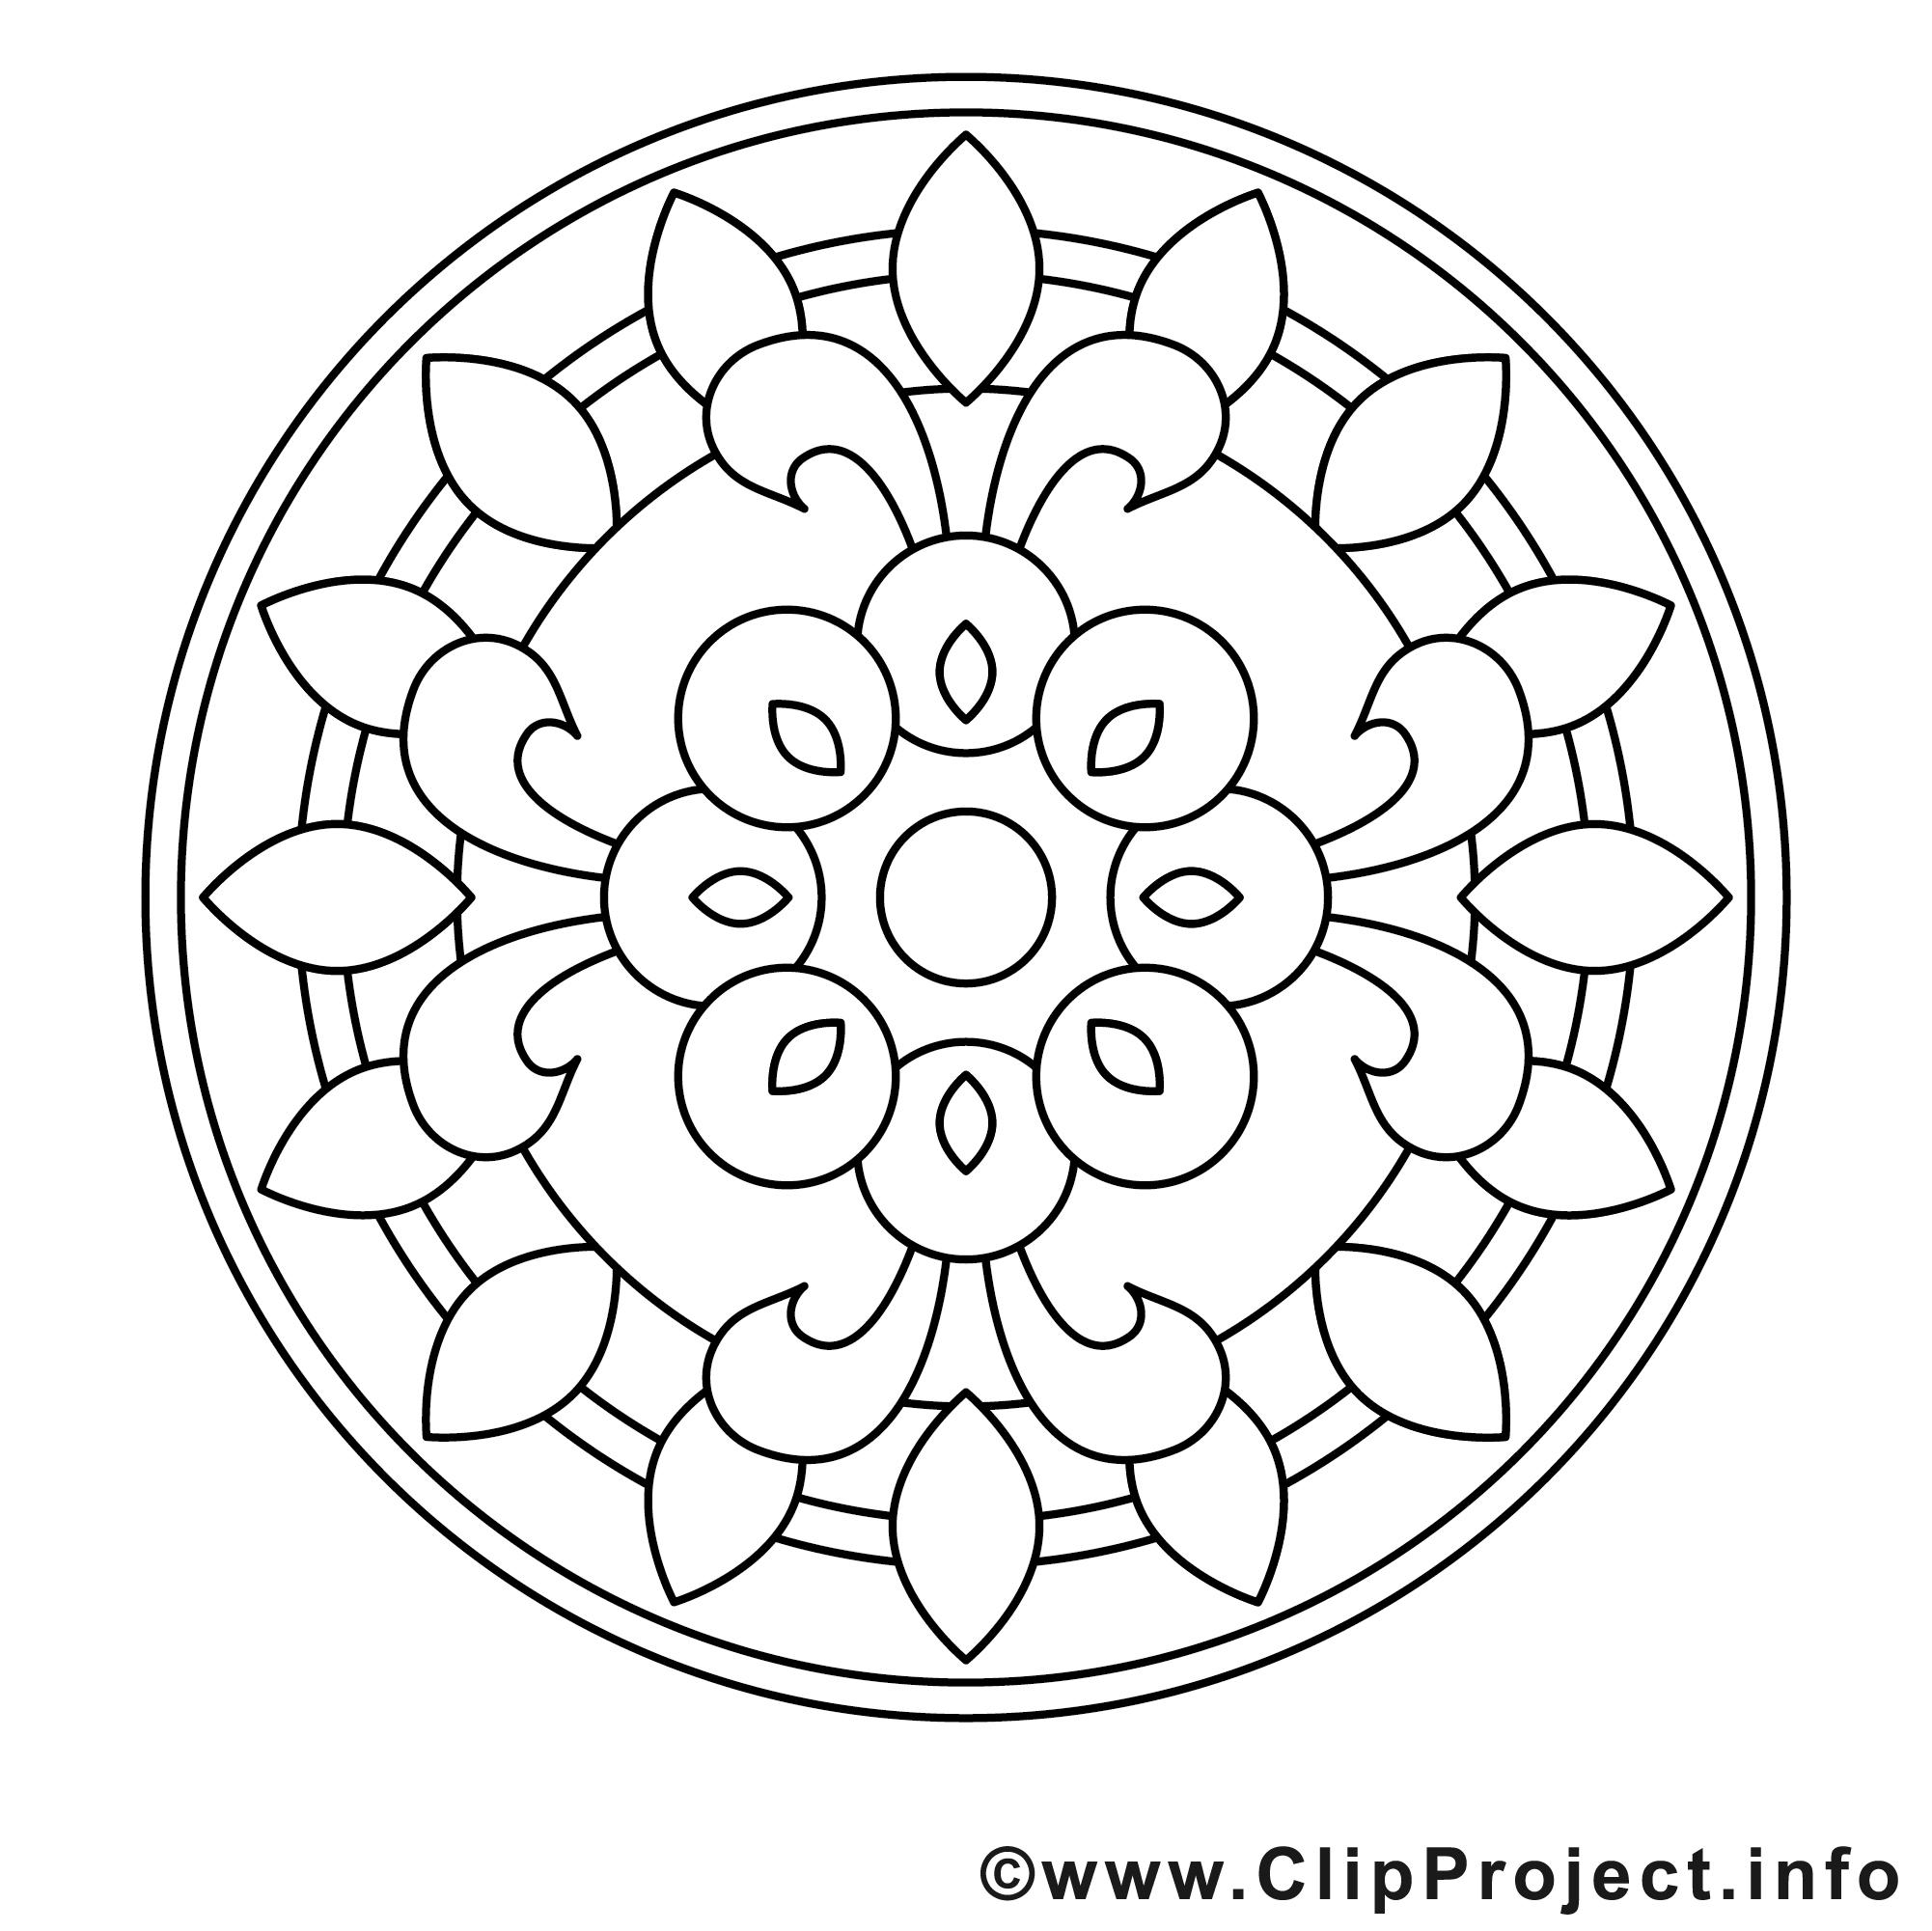 illustration gratuite mandalas à imprimer  mandalas